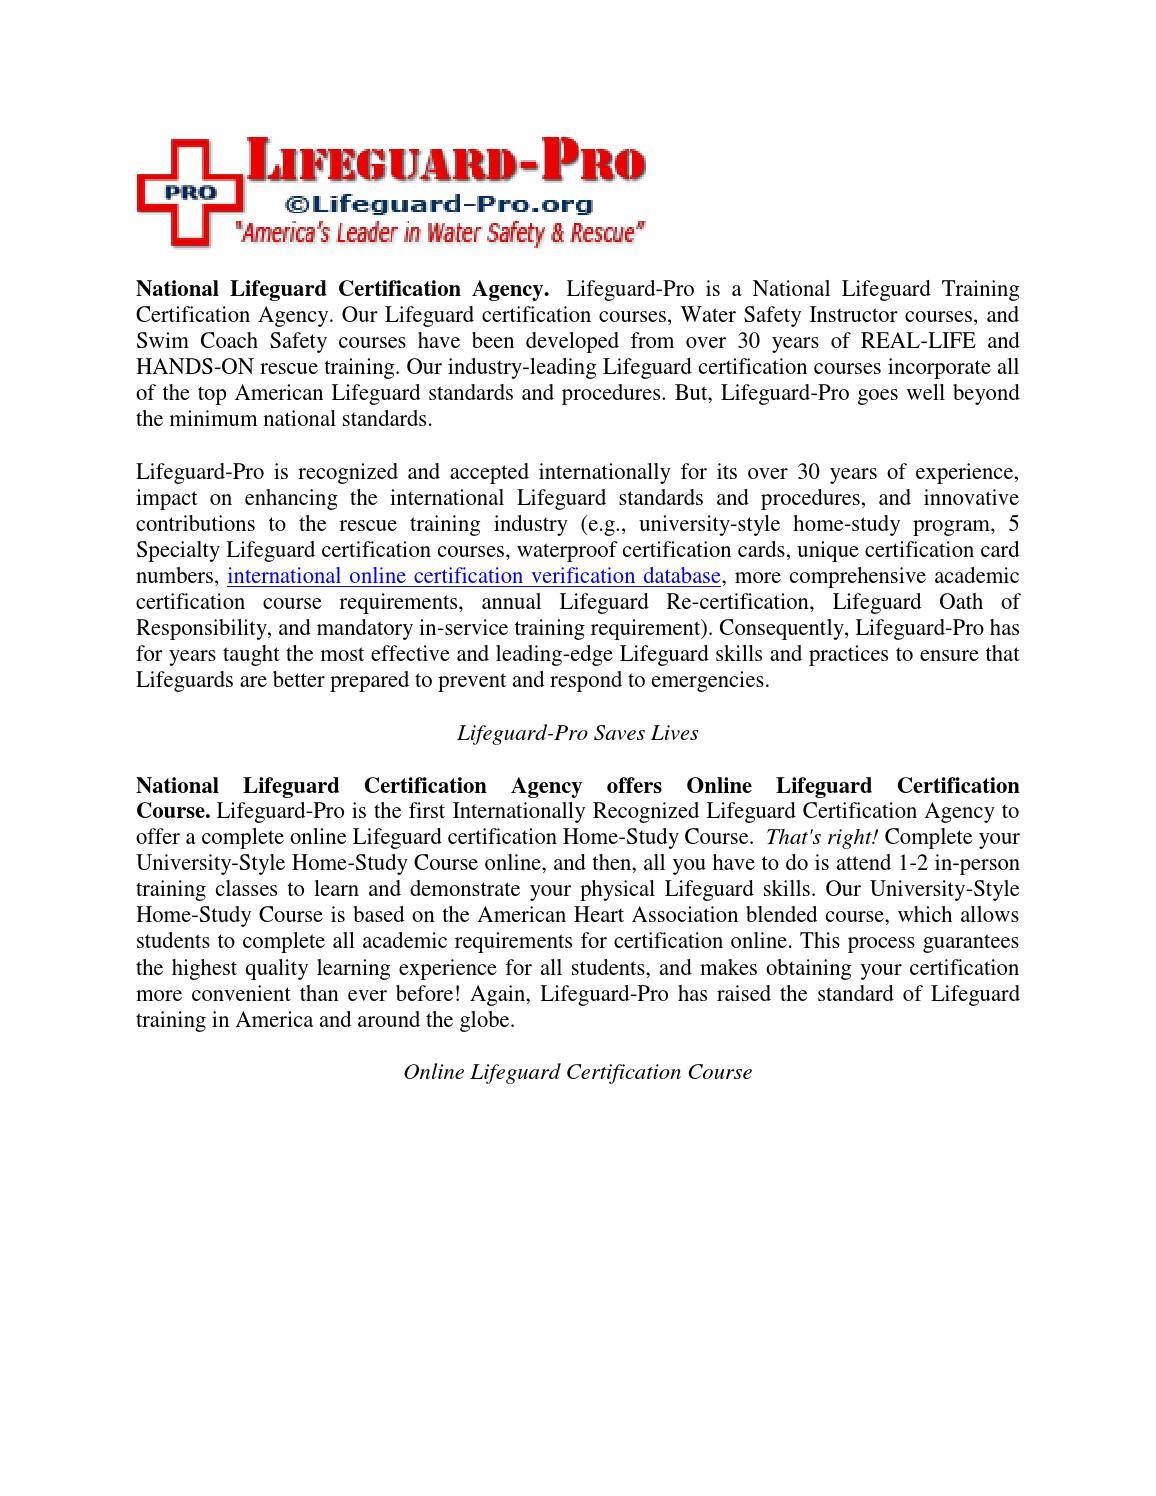 National Lifeguard Certification Agency Offers Online Lifeguard